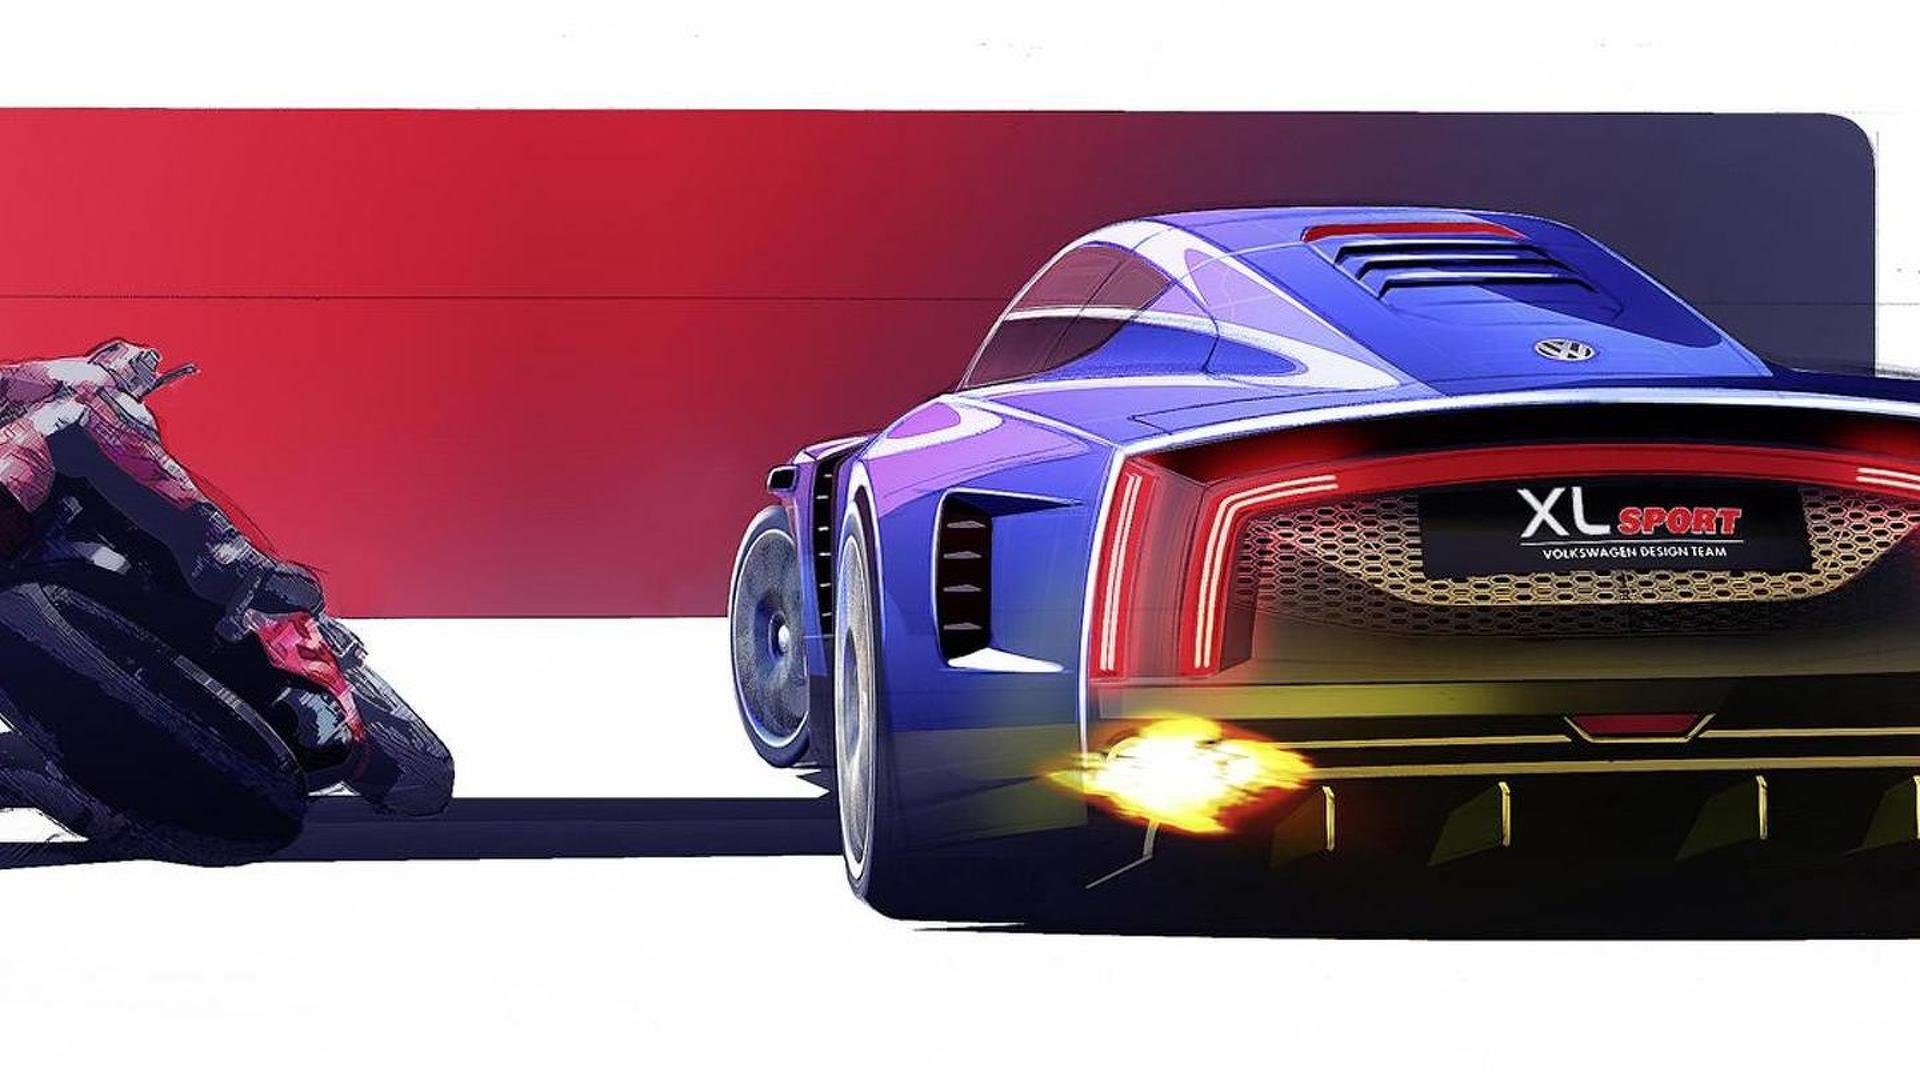 XL Sport от Volkswagen Design Team